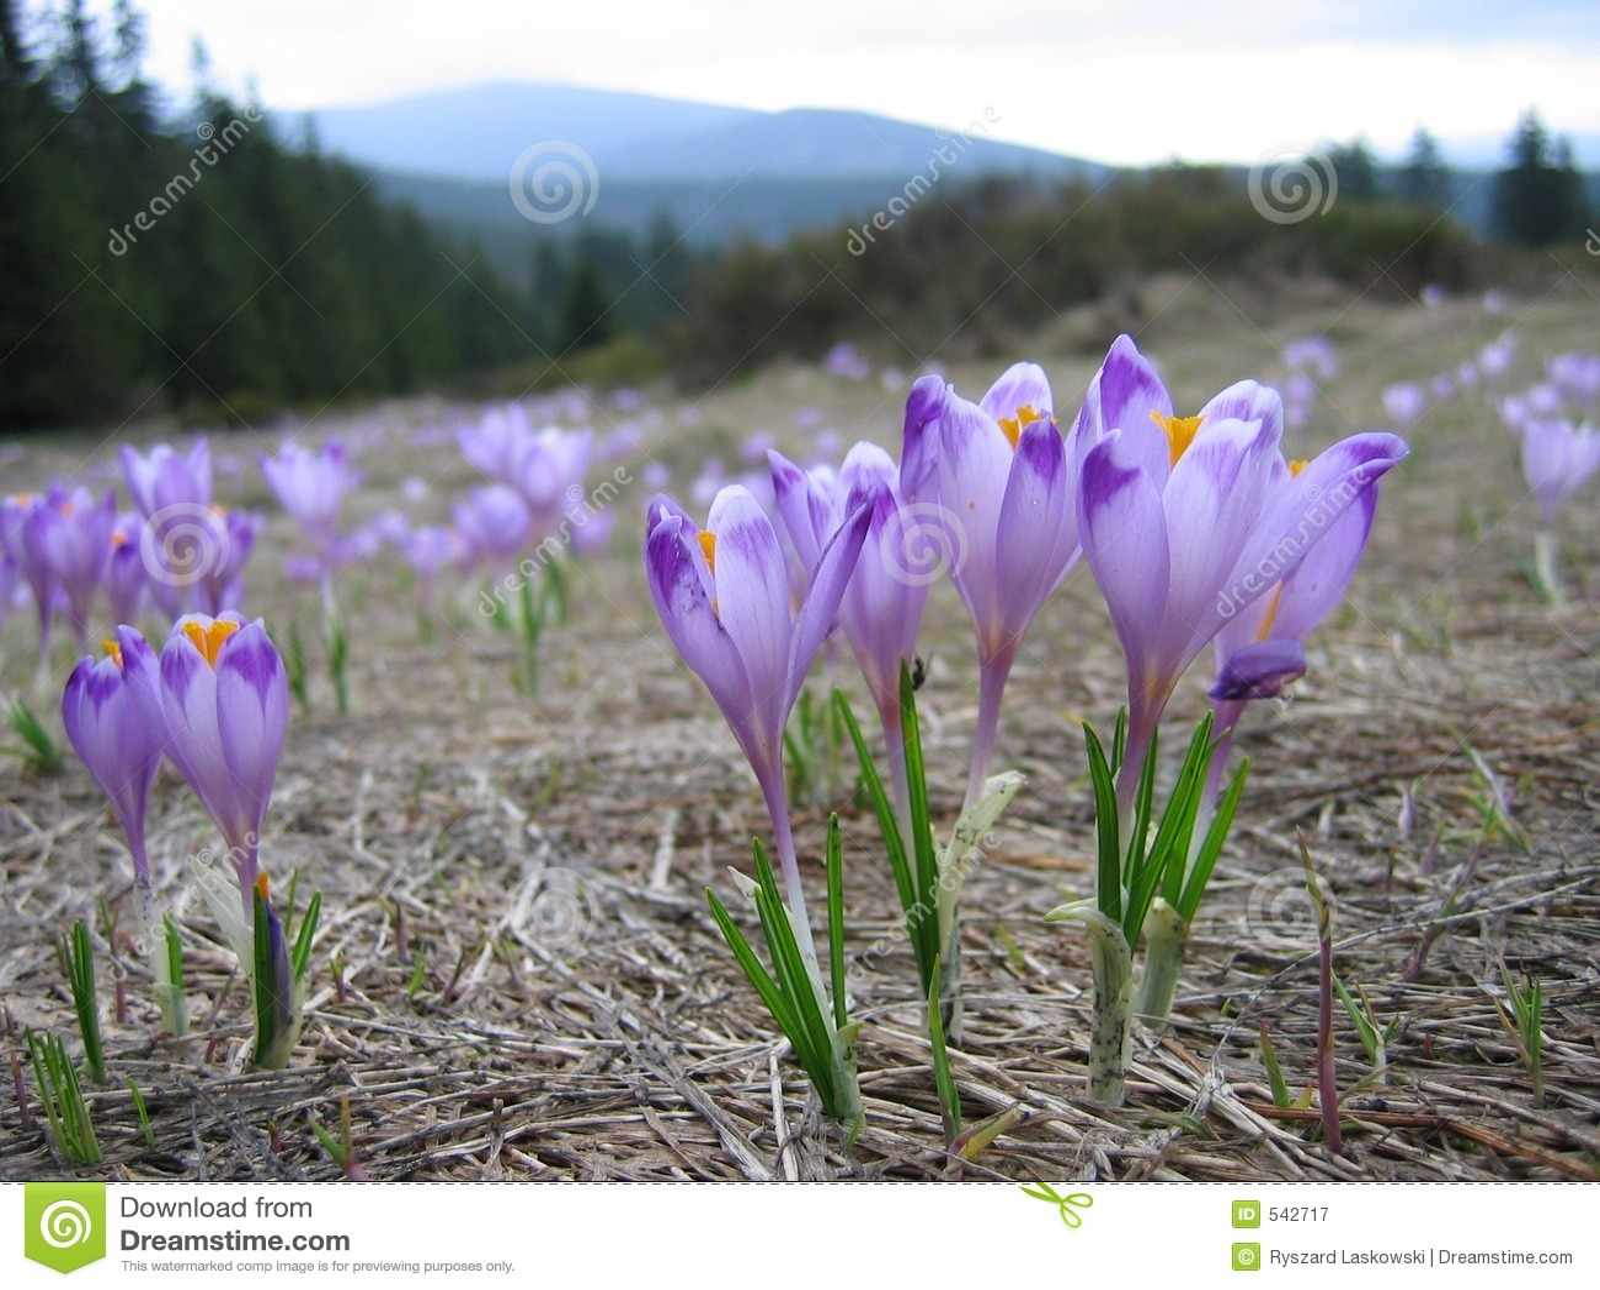 Download 番红花 库存图片. 图片 包括有 番红花, 紫罗兰色, 波兰, 春天, 绽放, 横向, 欧洲, 工厂 - 542717